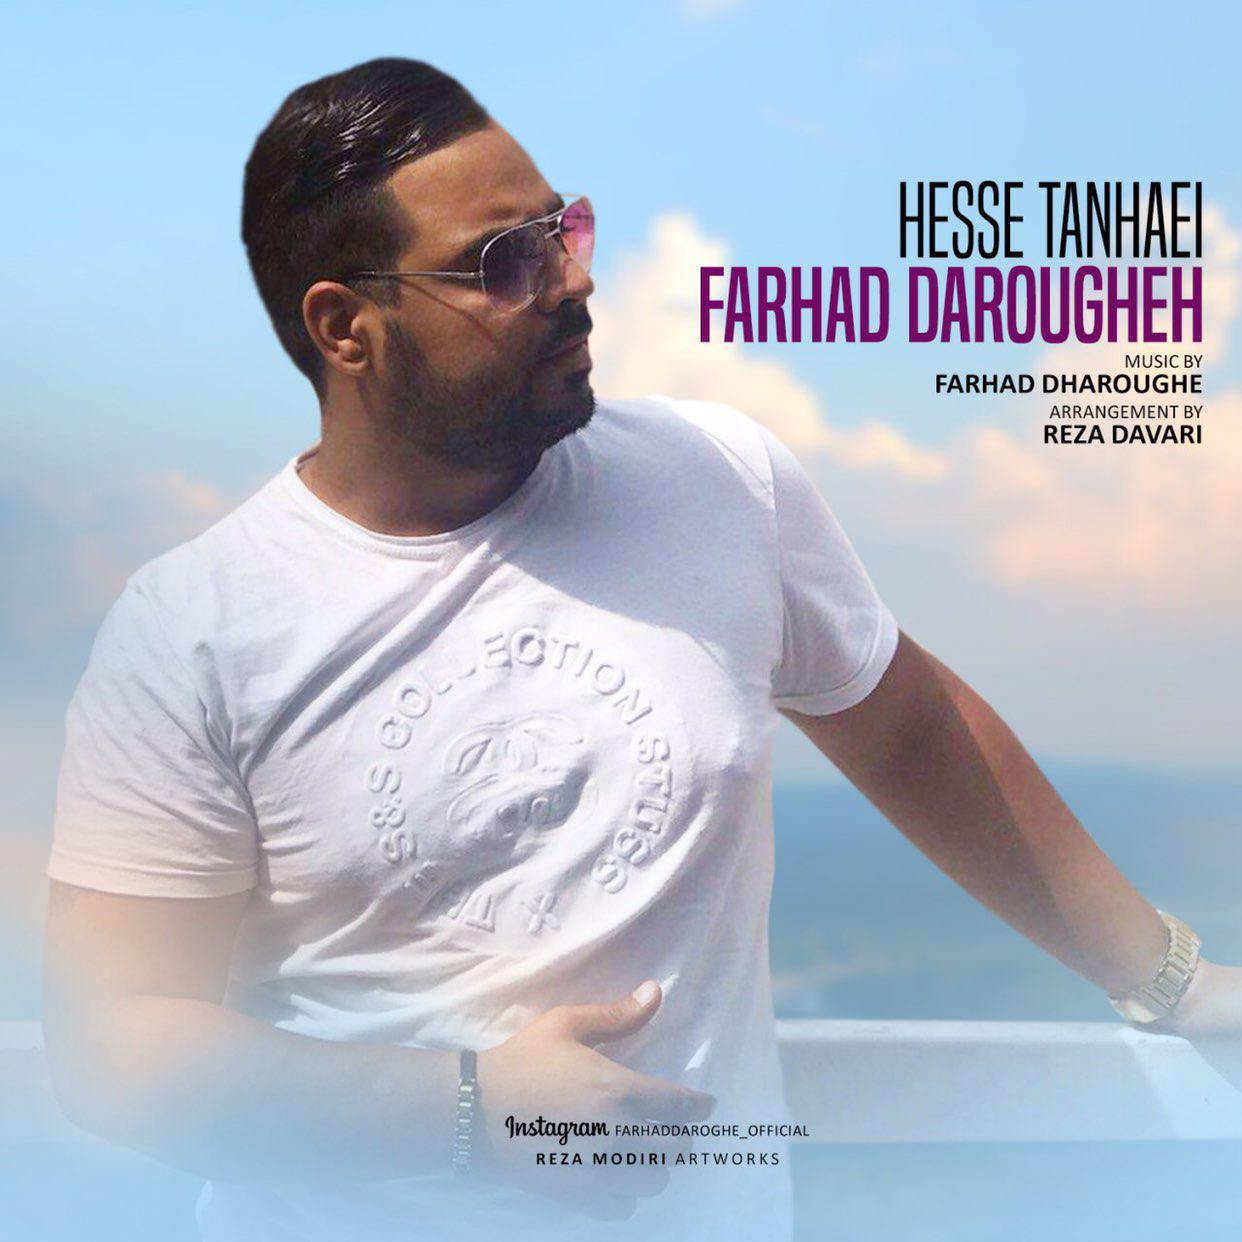 Farhad Daroughe – Hesse Tanhaei